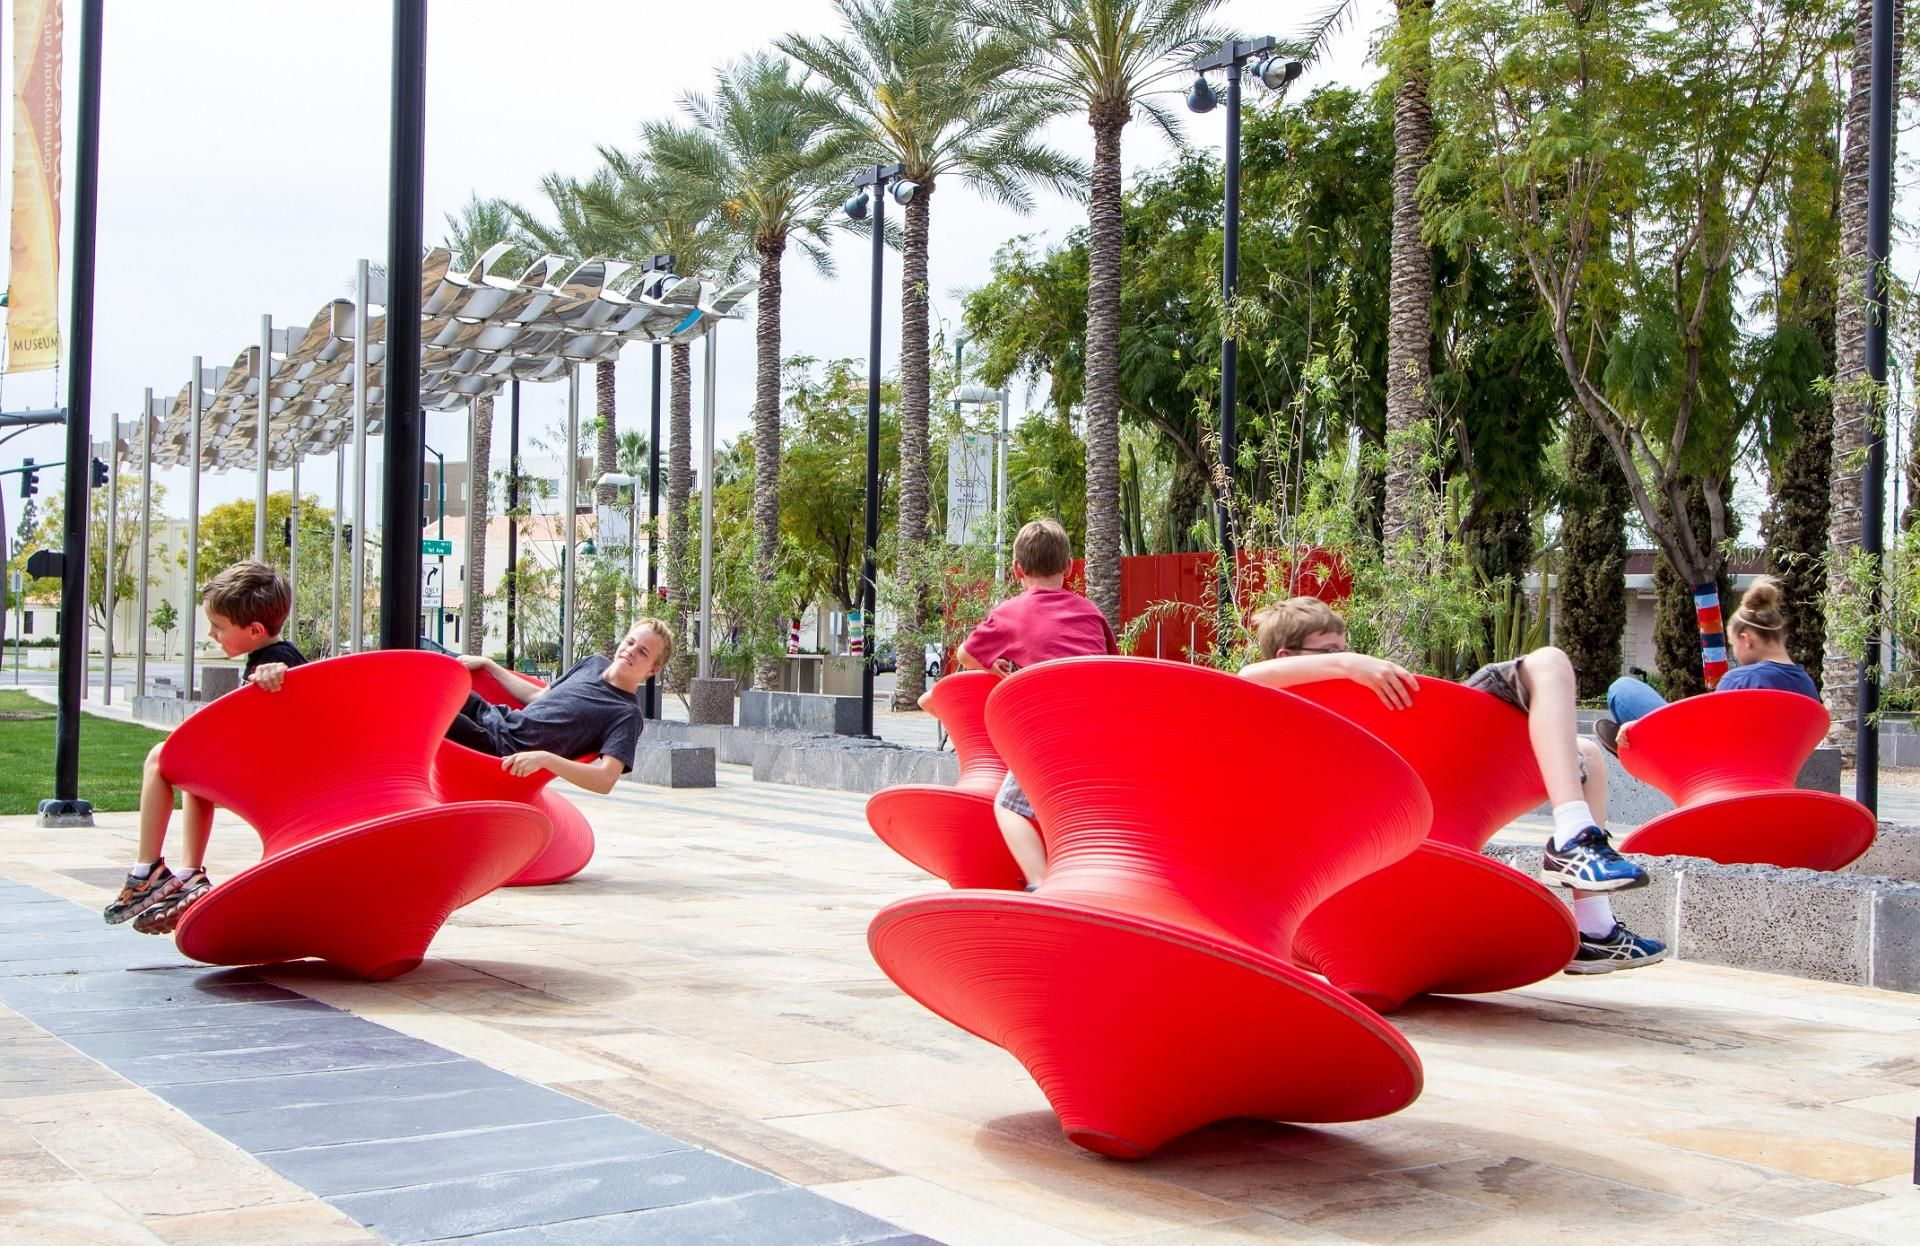 M s de 25 ideas incre bles sobre mesa arizona en pinterest for Ideas decoracion baratas